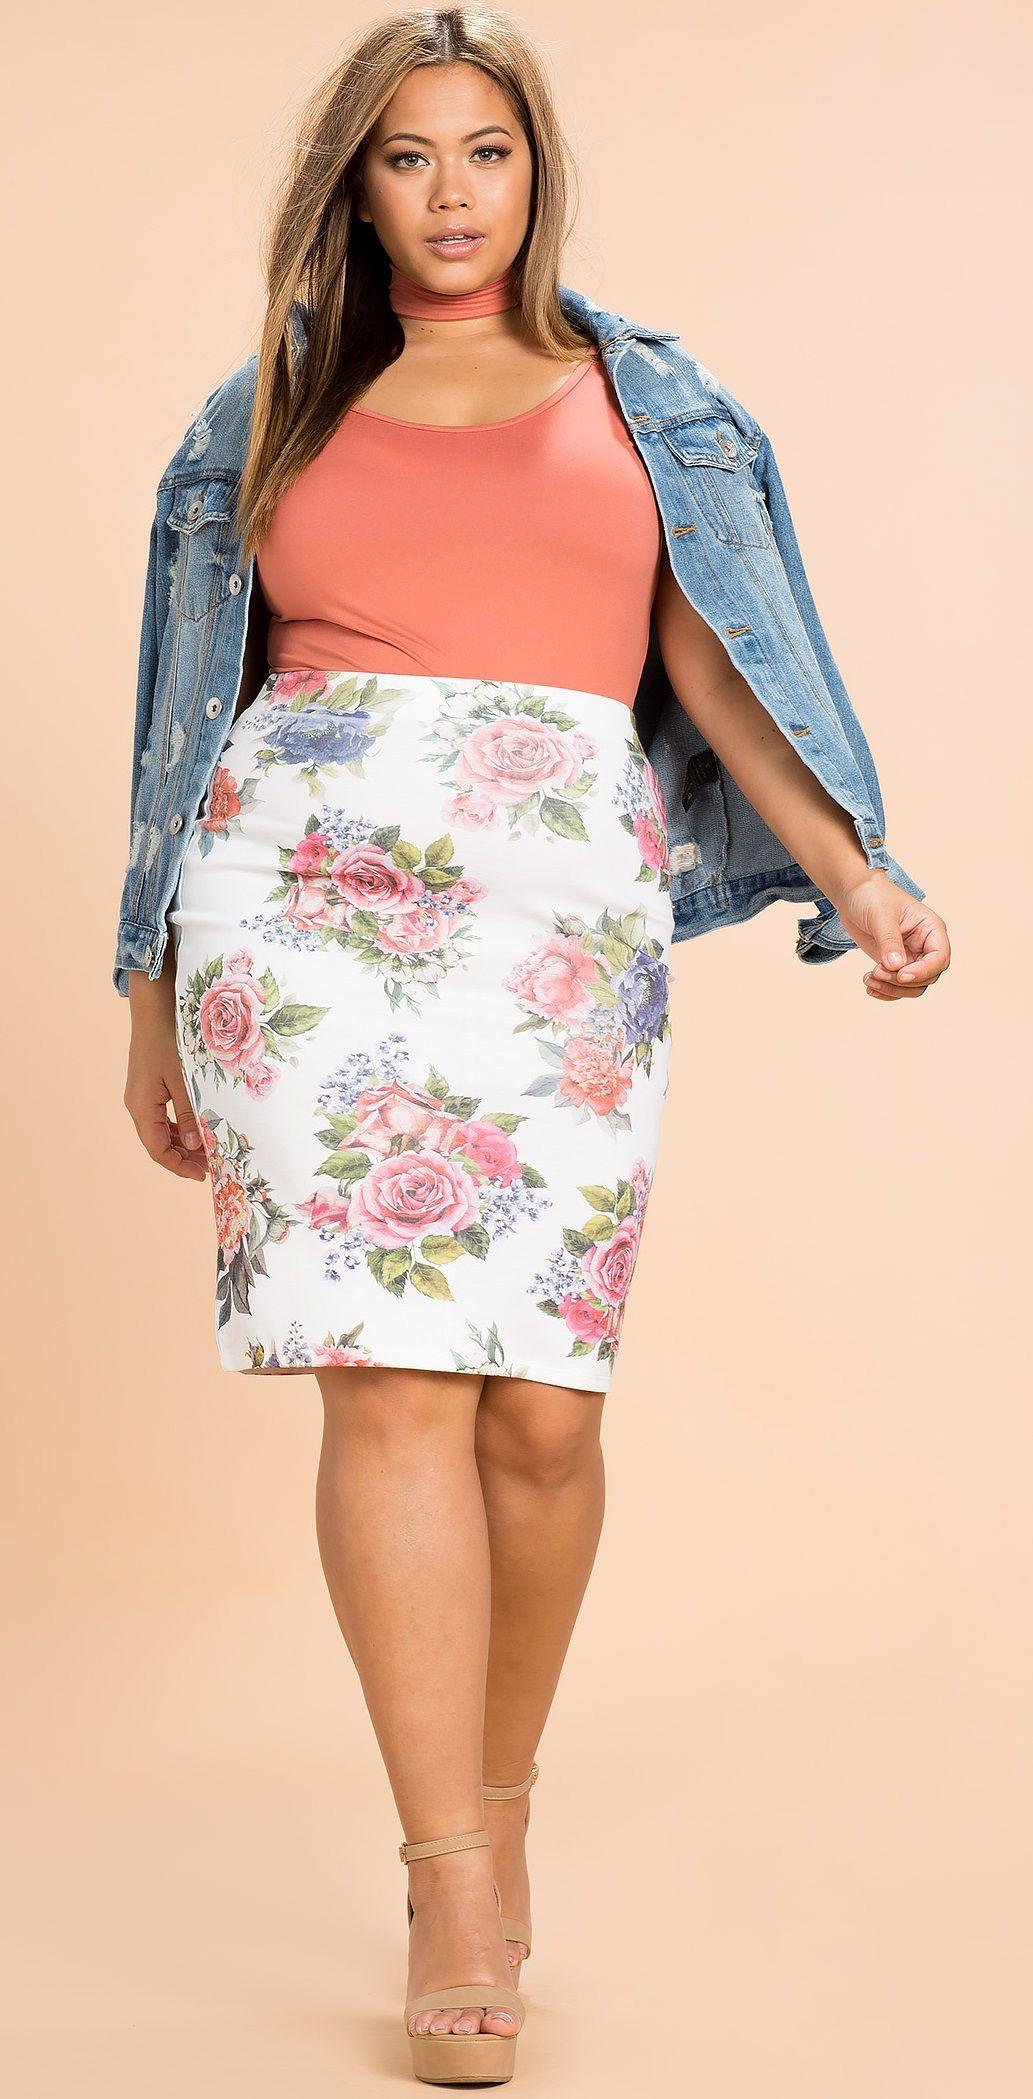 Plus Size Dress in 2019 | Plus size pencil skirt, Plus size ...